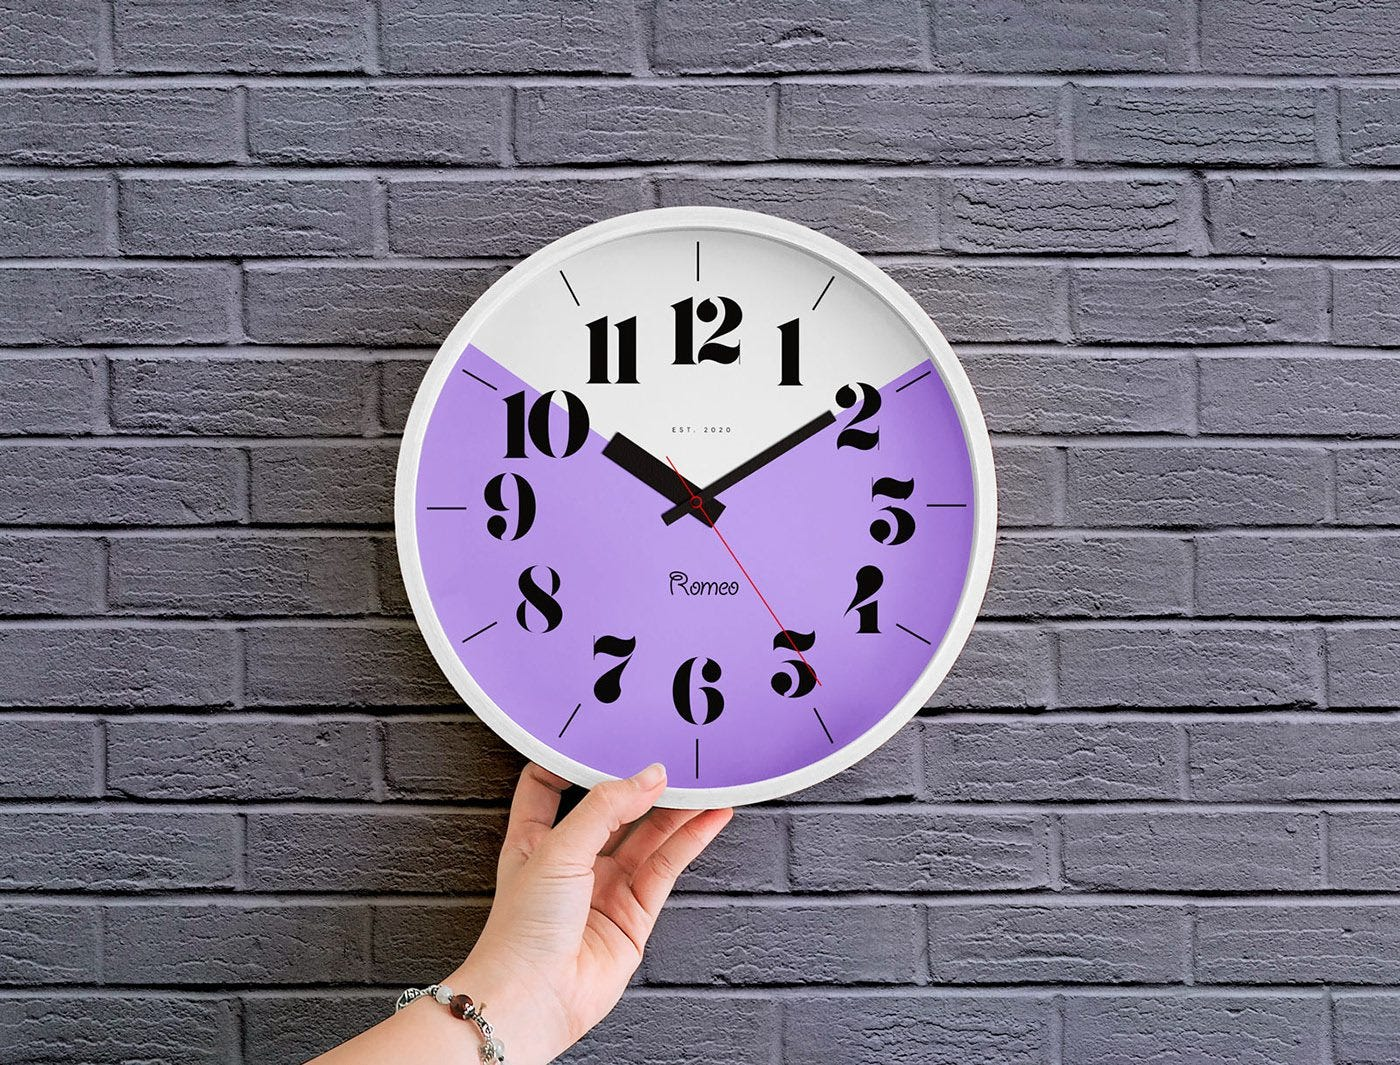 Free Wall Clock Mockup PSD скачать бесплатно | Каталог графики